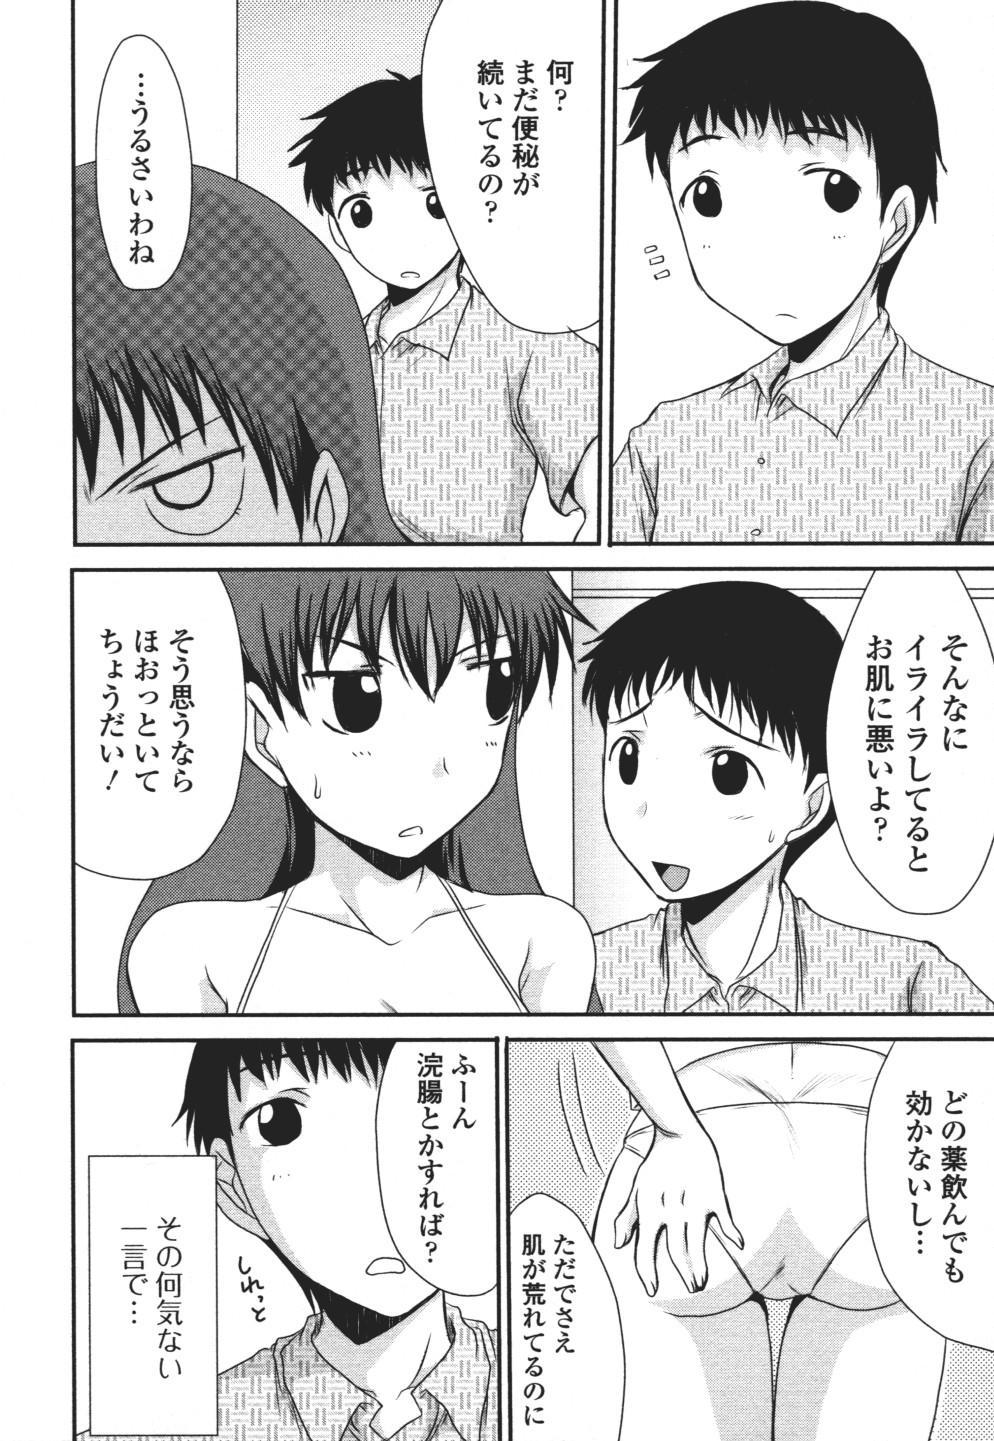 Nozoite wa Ikenai 3 - Do Not Peep! 3 118